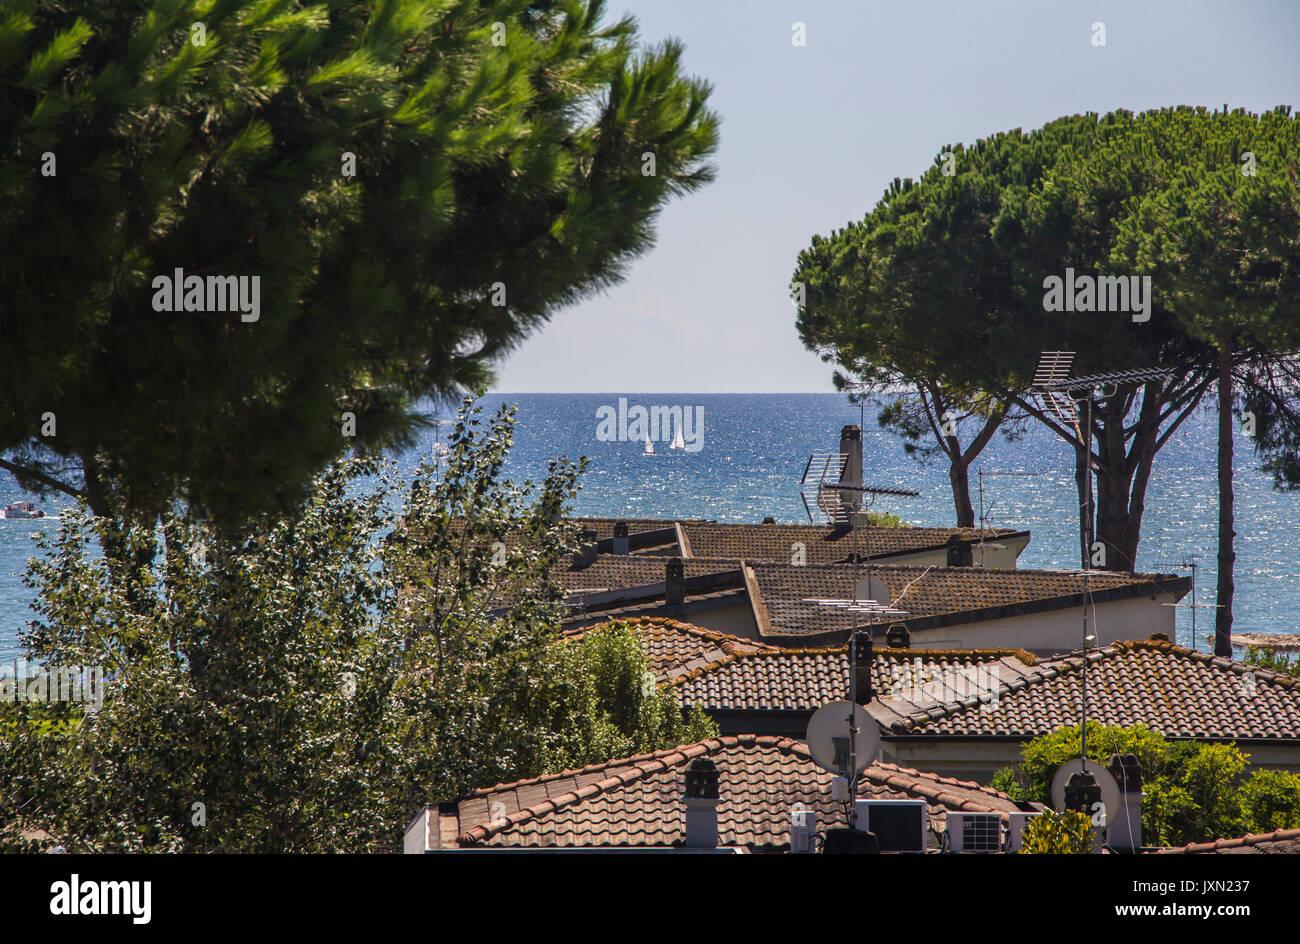 Tyrrhenian sea, view of tiled roofs, stone pines, yachts and seacoast of Terracina, Lazio, Italy - Stock Image